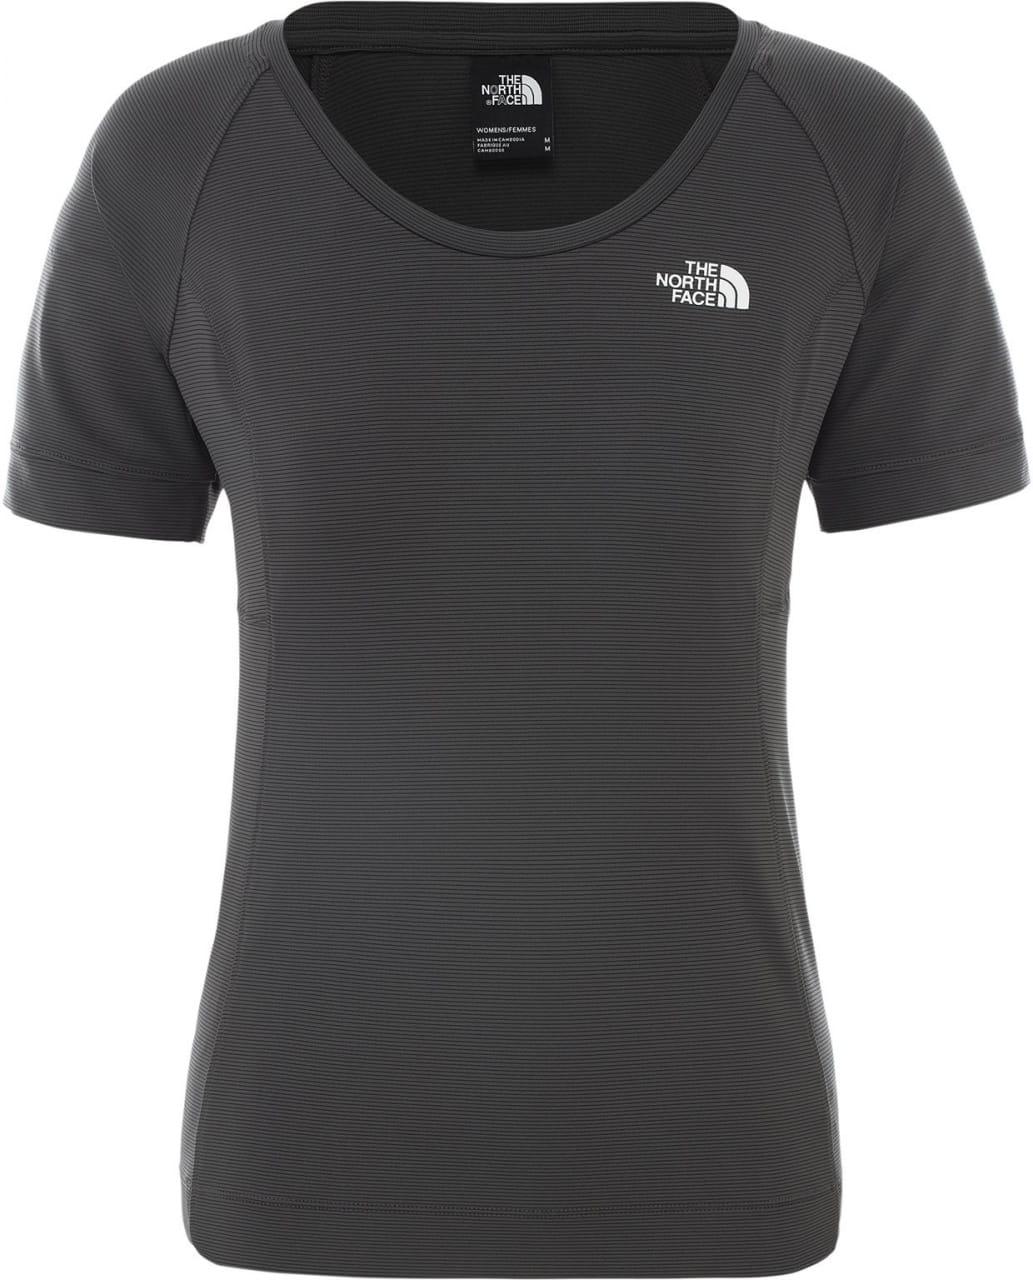 T-Shirts The North Face Women's Lightning T-Shirt